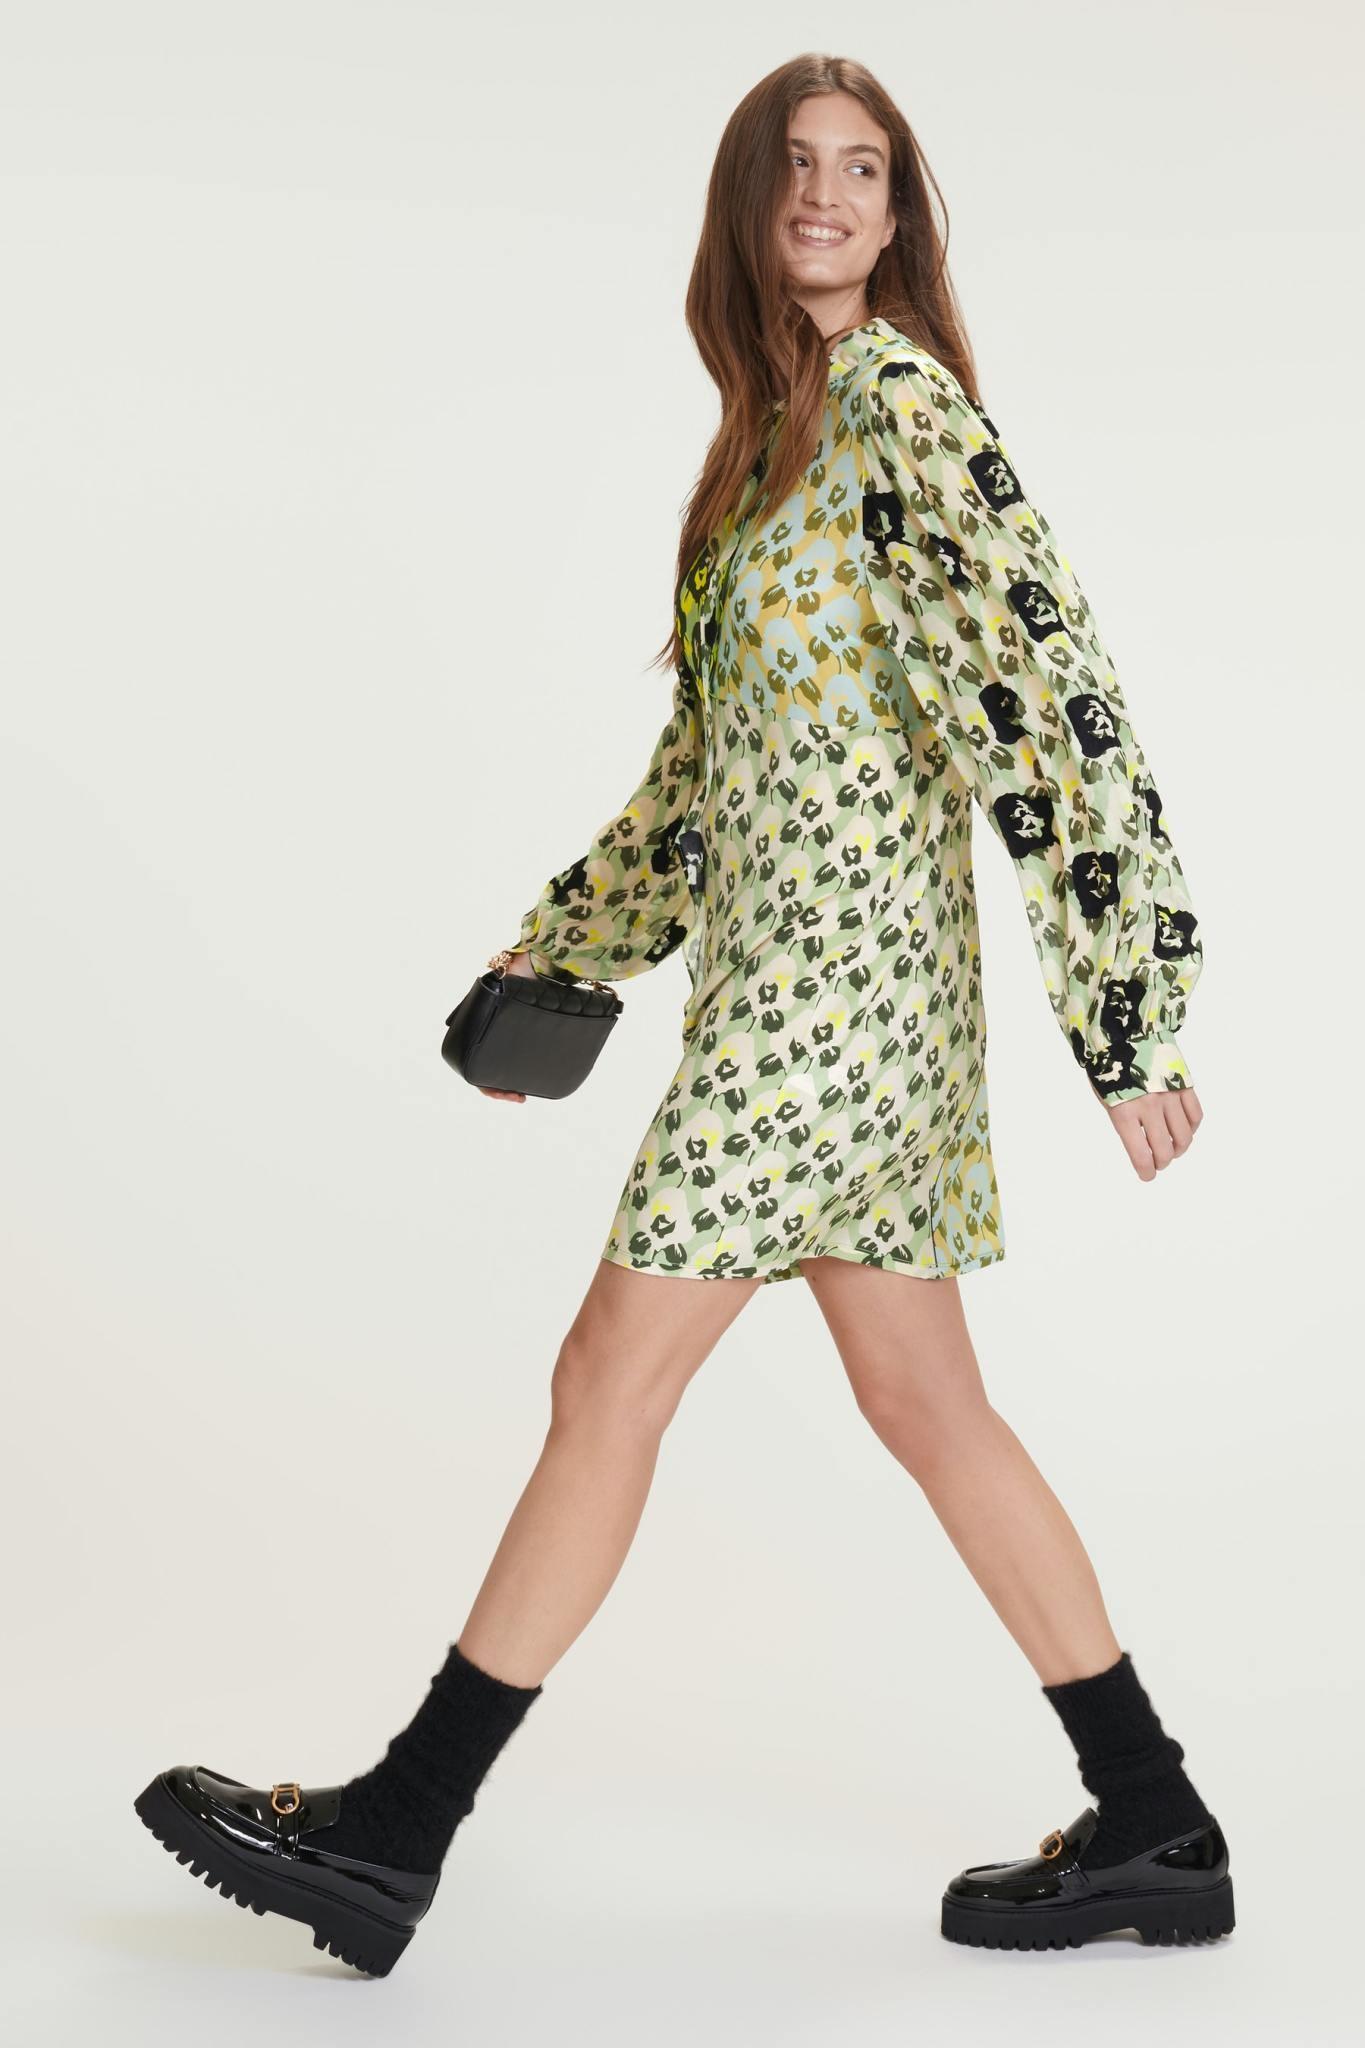 Flower patch dress Dorothee Schumacher-1